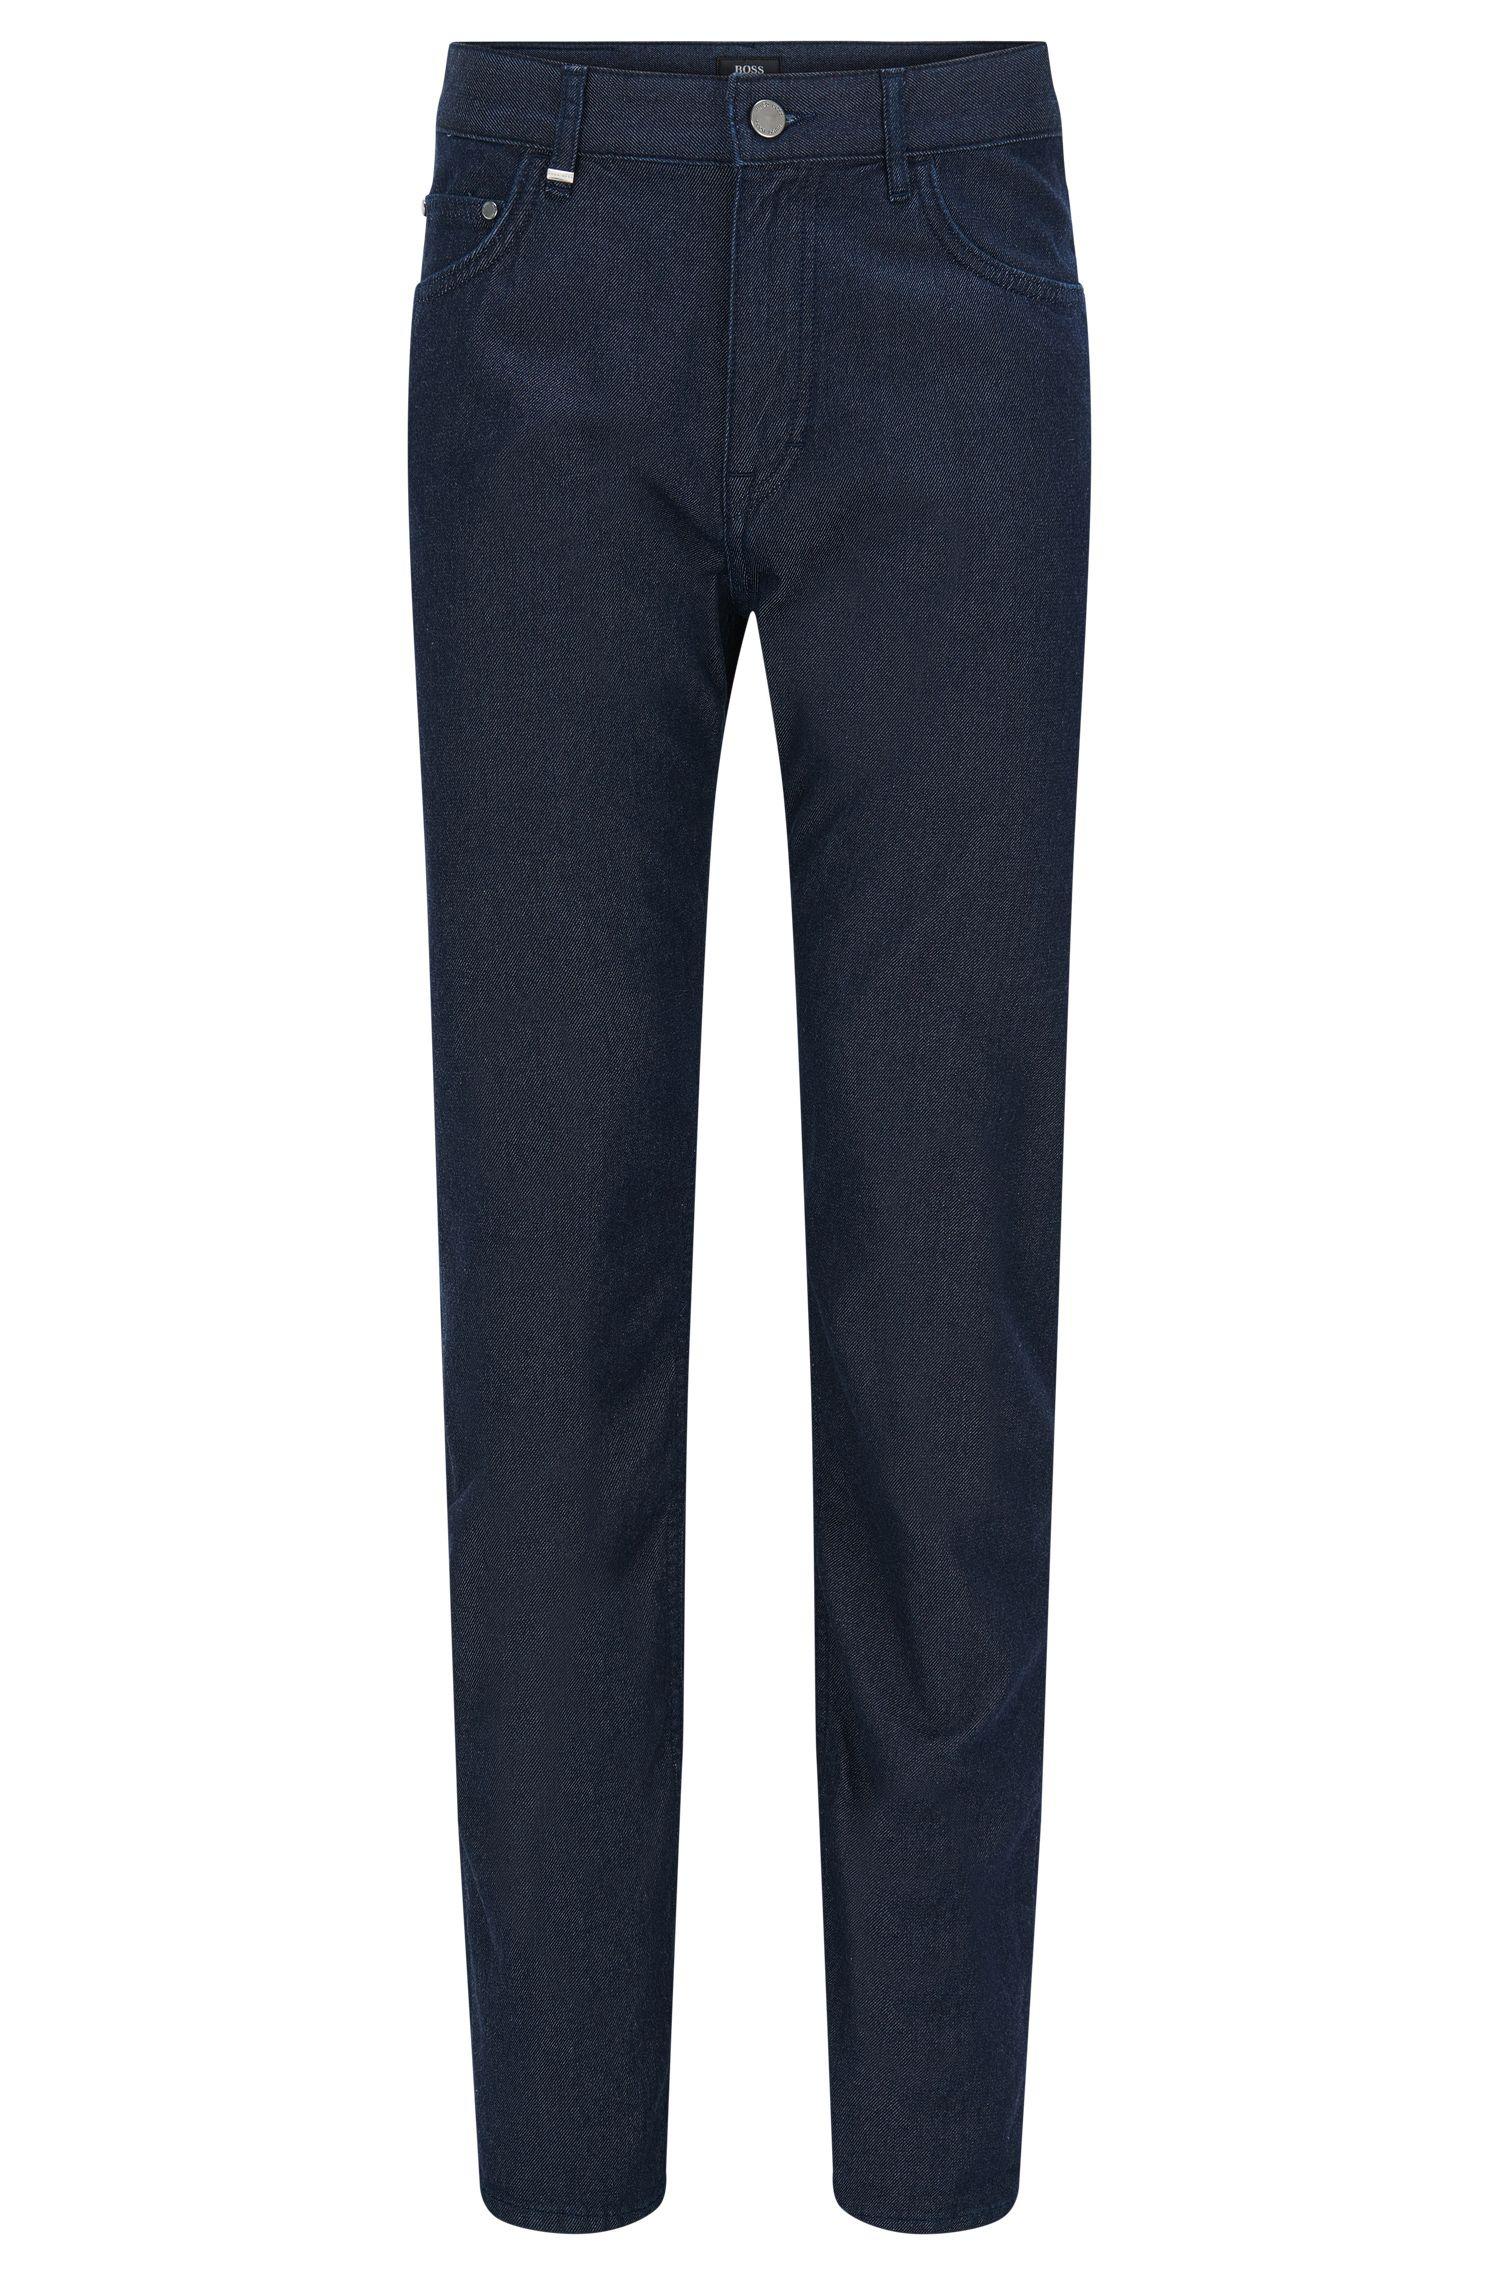 'Albany'   Comfort Fit, 9.5 oz Cotton Cashmere Jeans